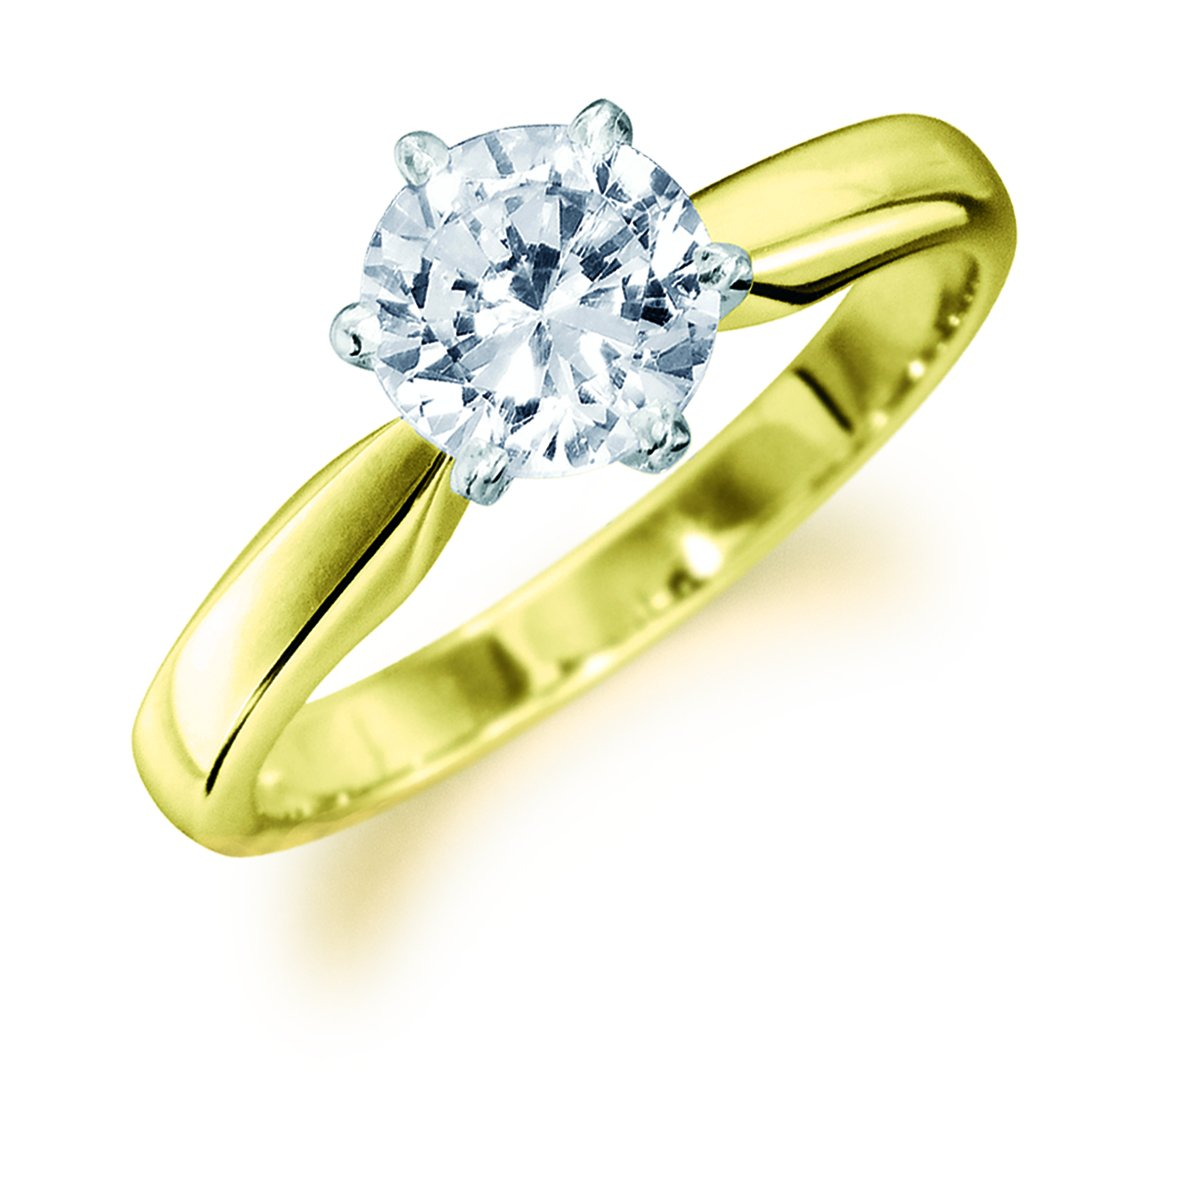 beautiful wedding rings beautiful wedding bands Beautiful wedding Rings Pictures Diamond Gold Silver Platinum Rings